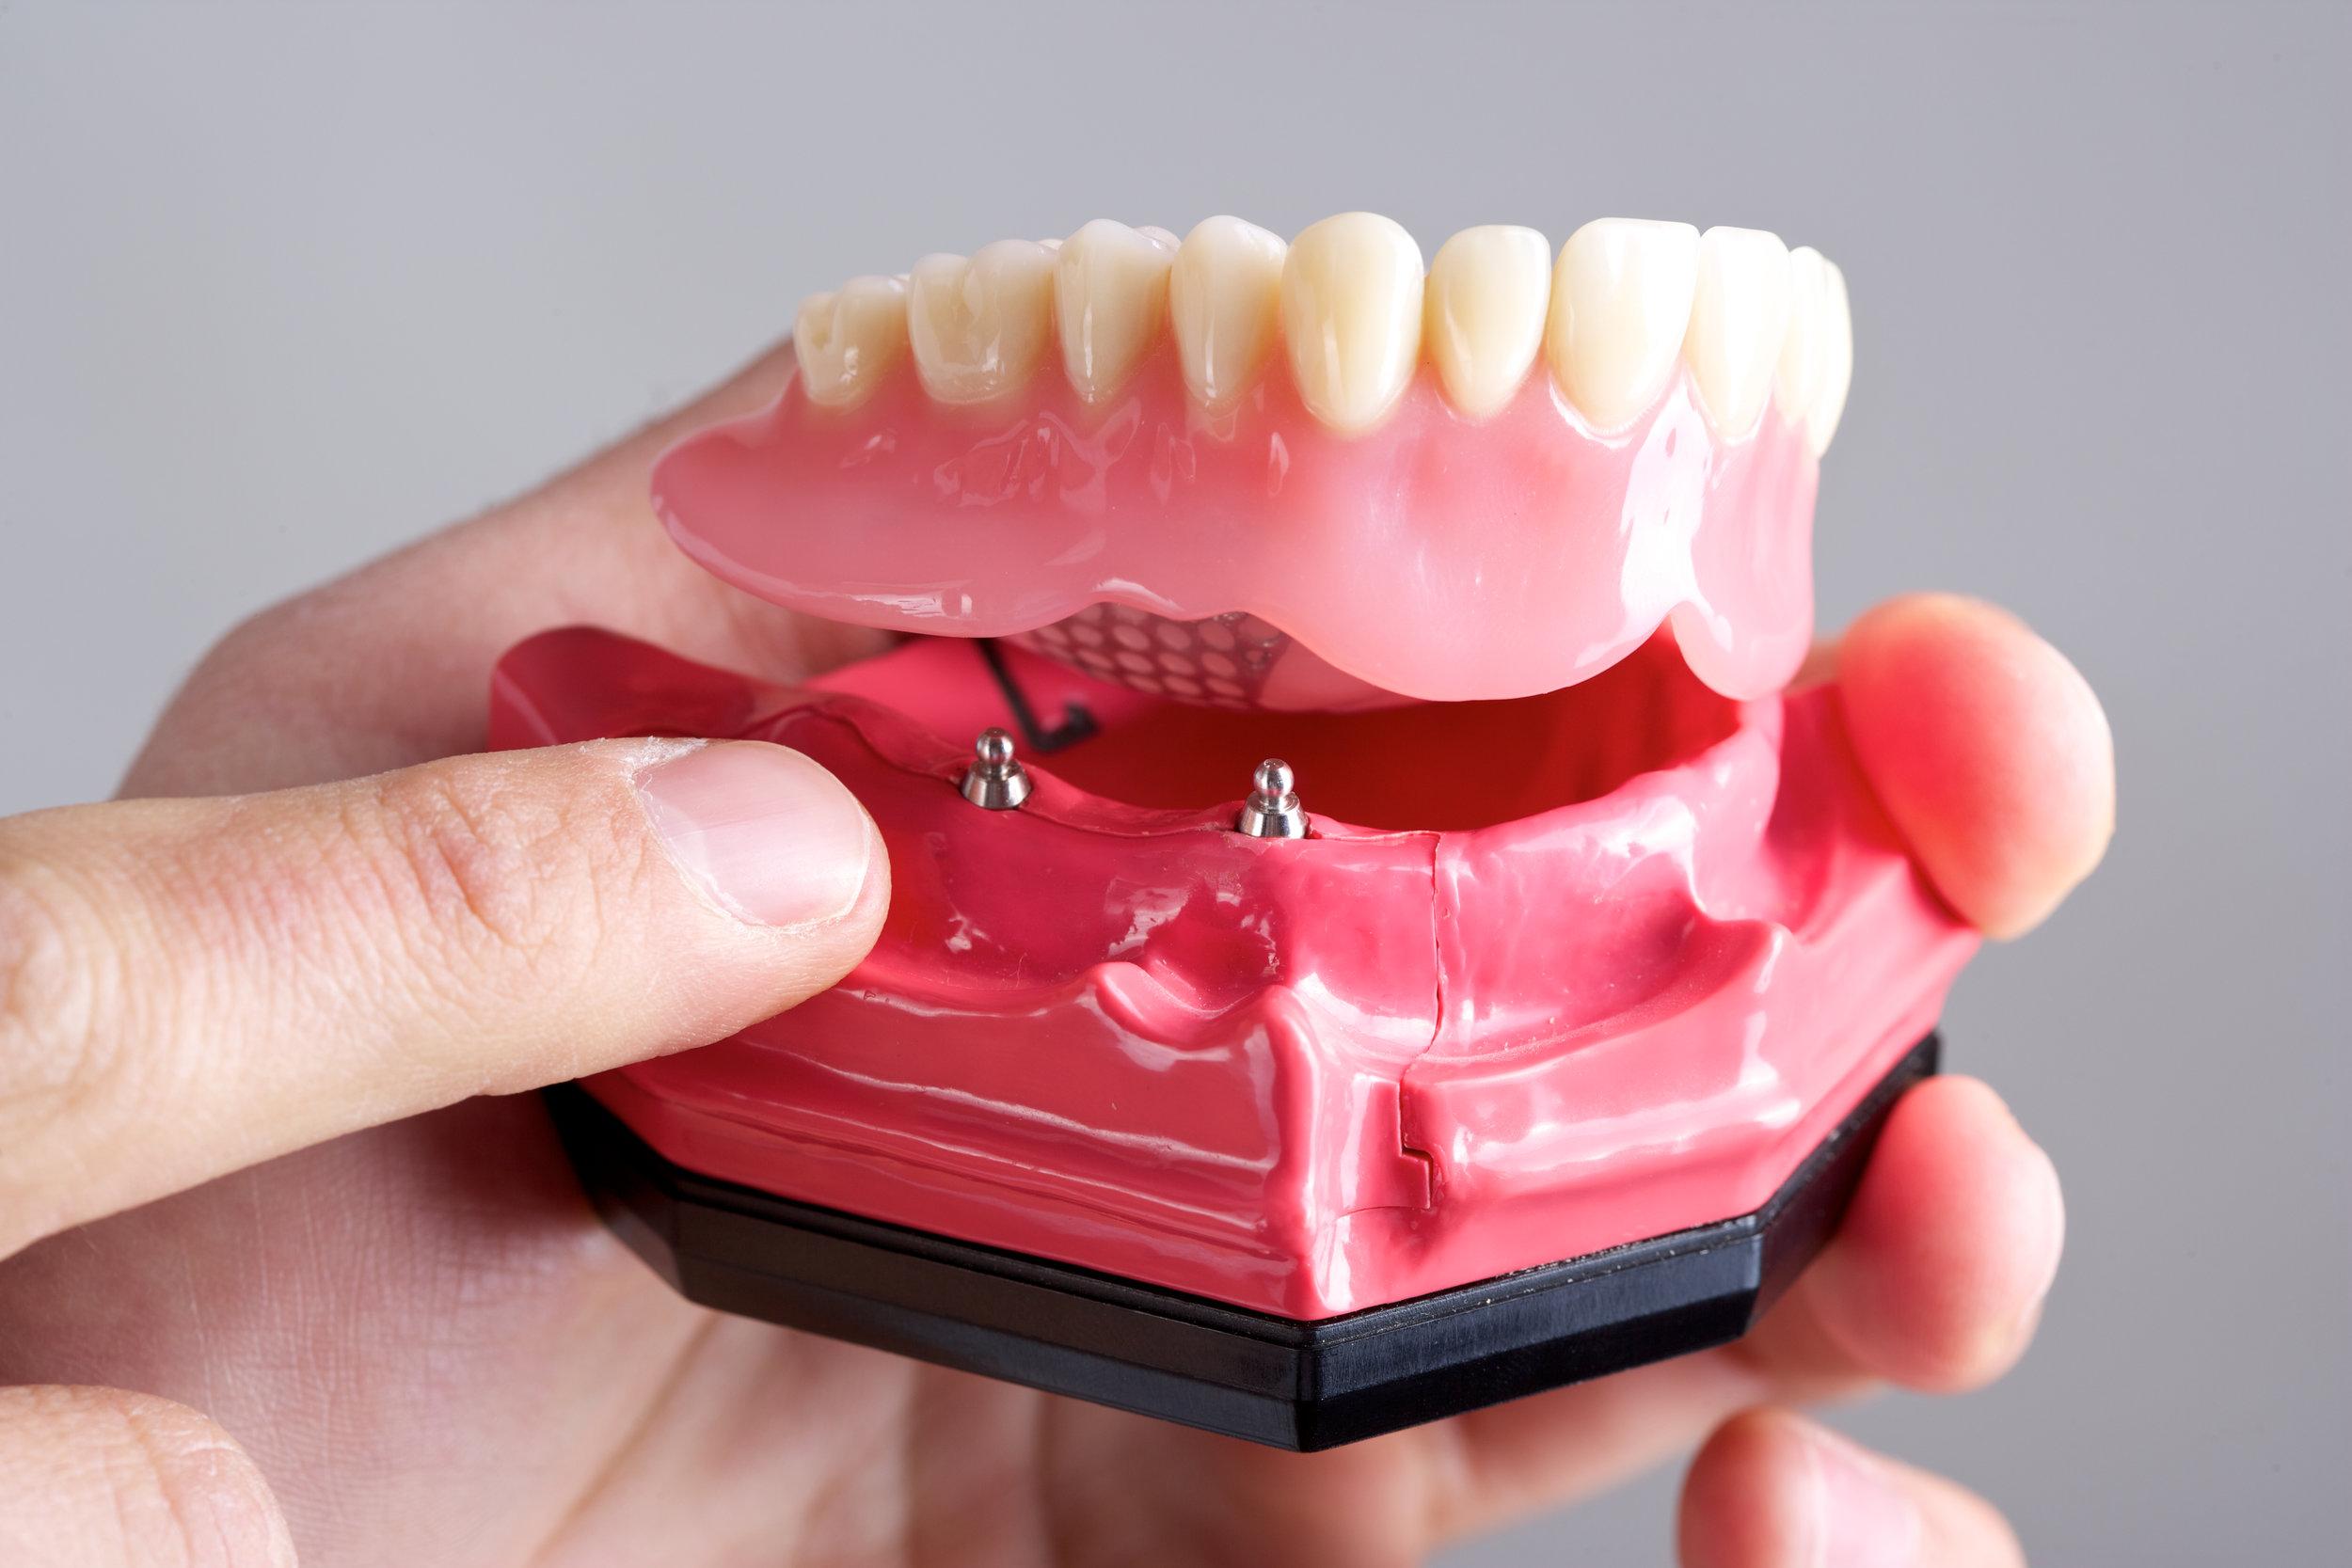 Dental Implants with Eastlake Center for Implants and Restorative Dentistry